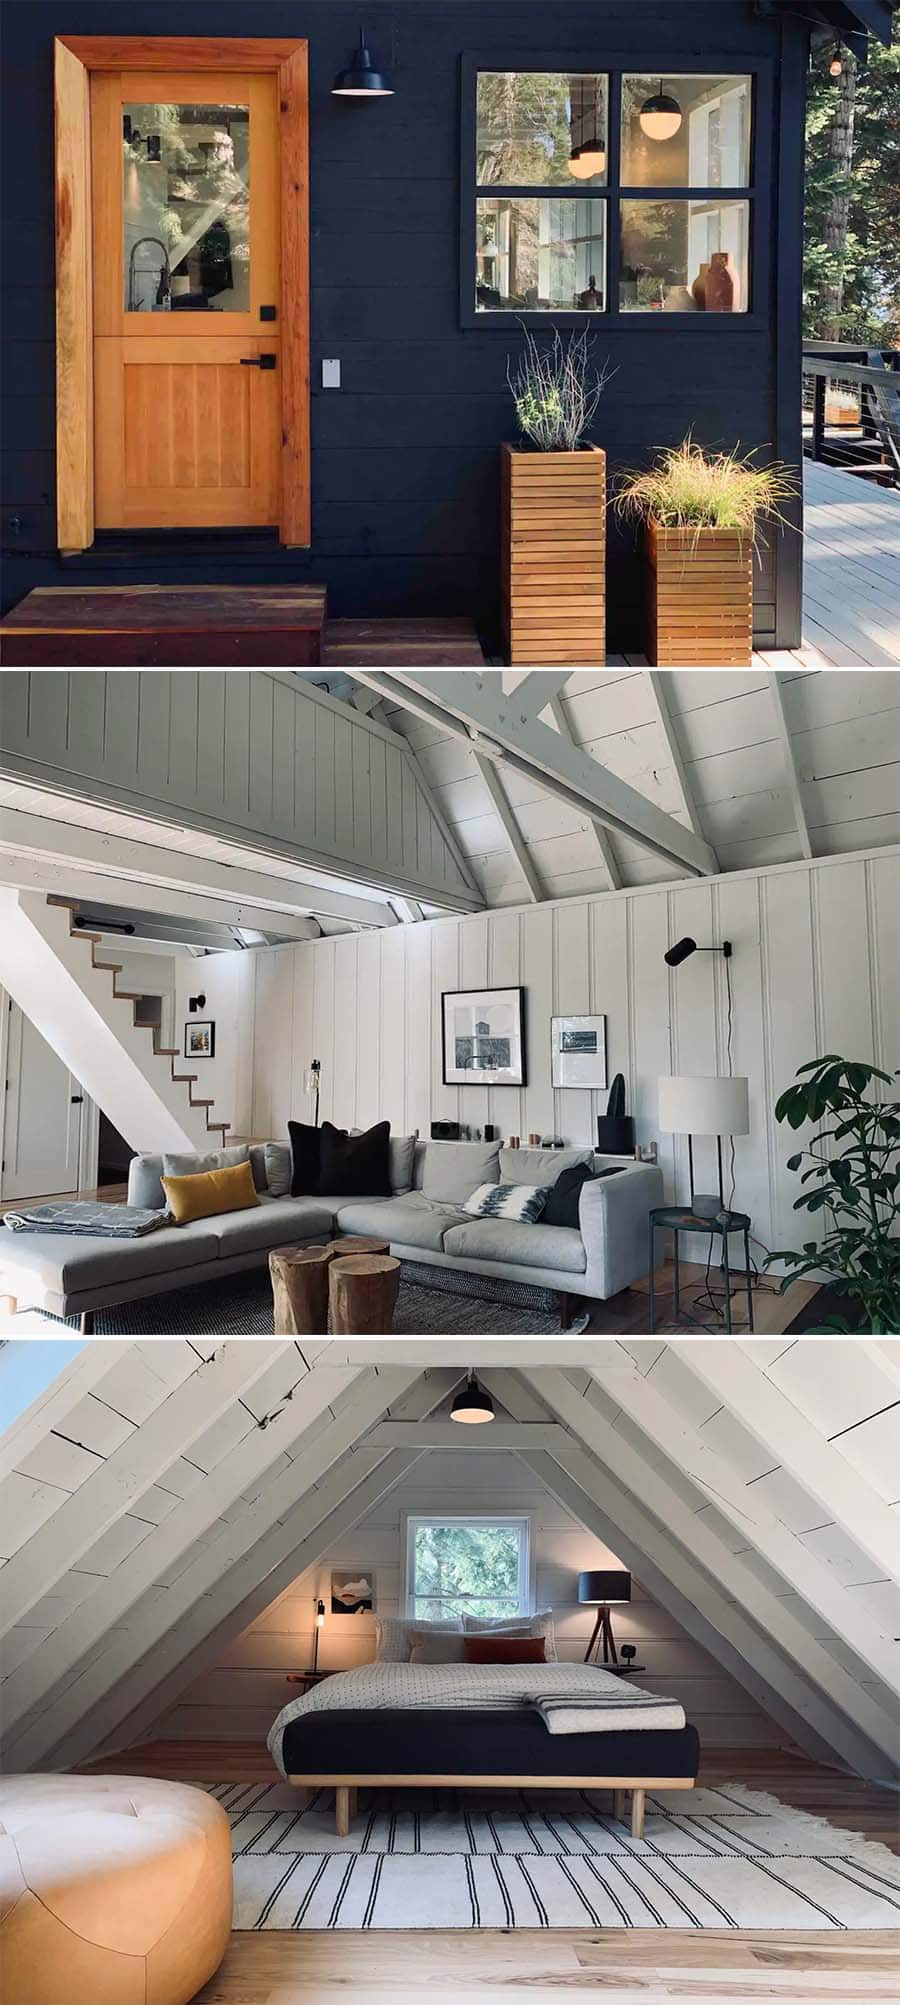 Little Black cabin airbnb